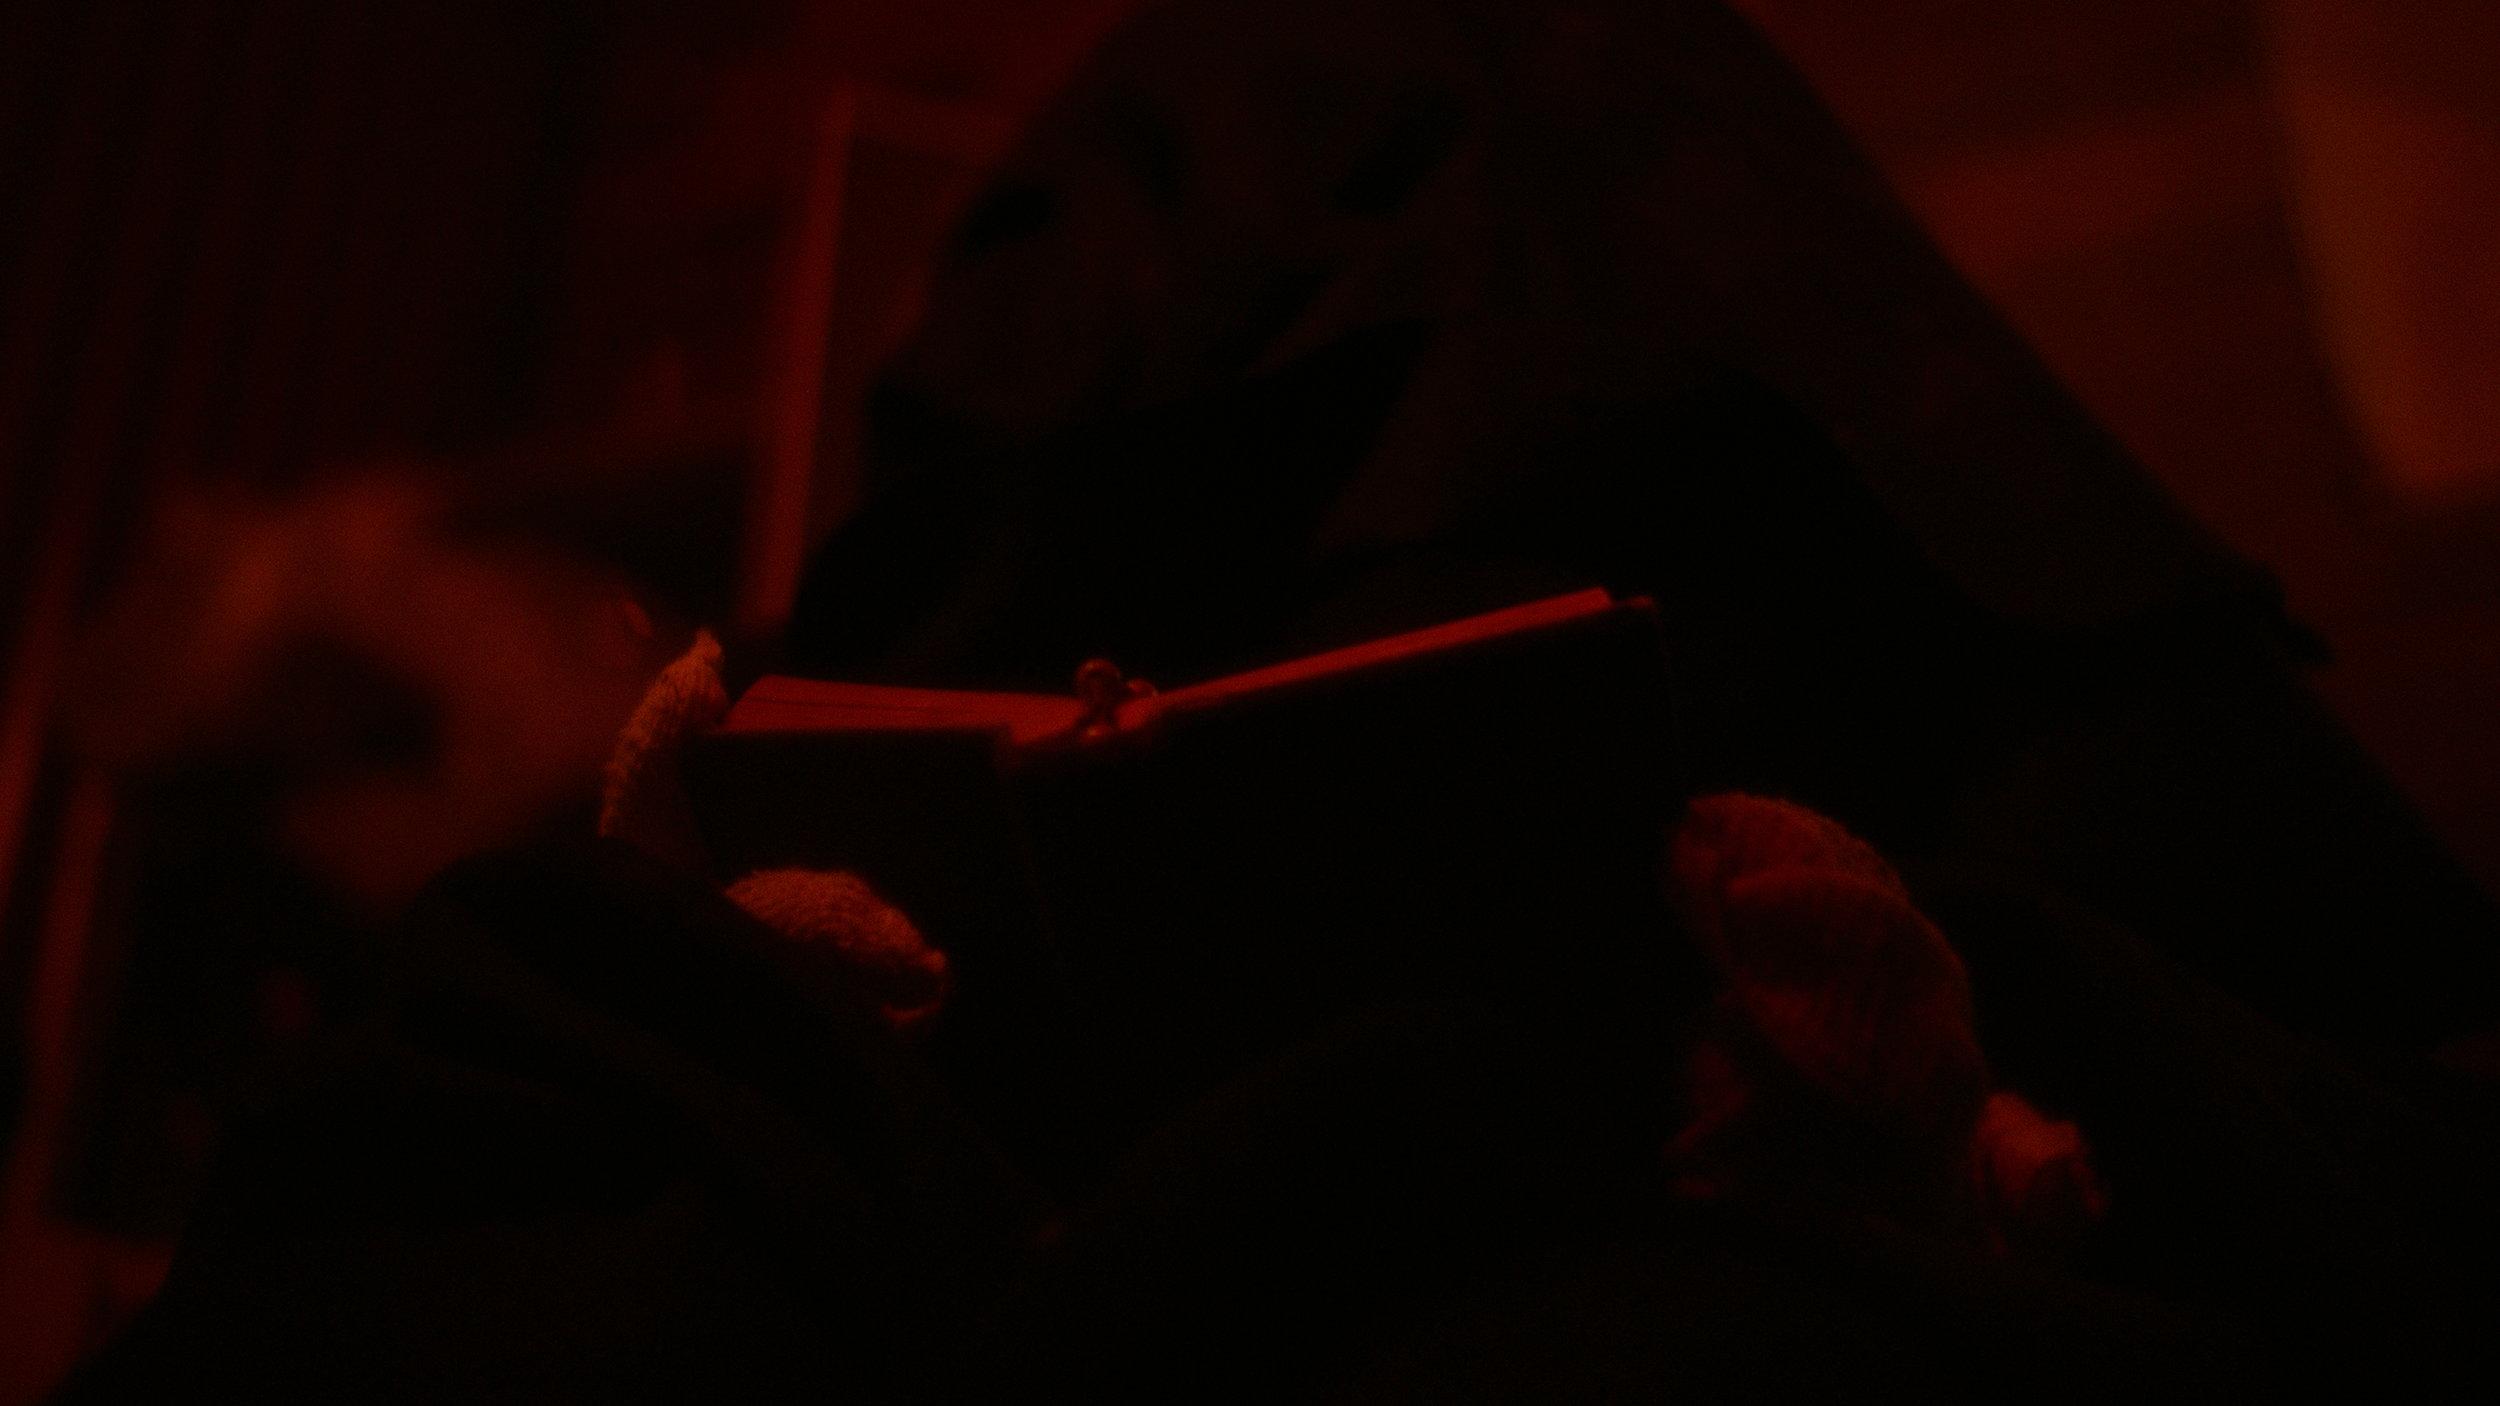 Cletus reads the bible - Red Christmas Photo by Douglas Burdorff.jpeg